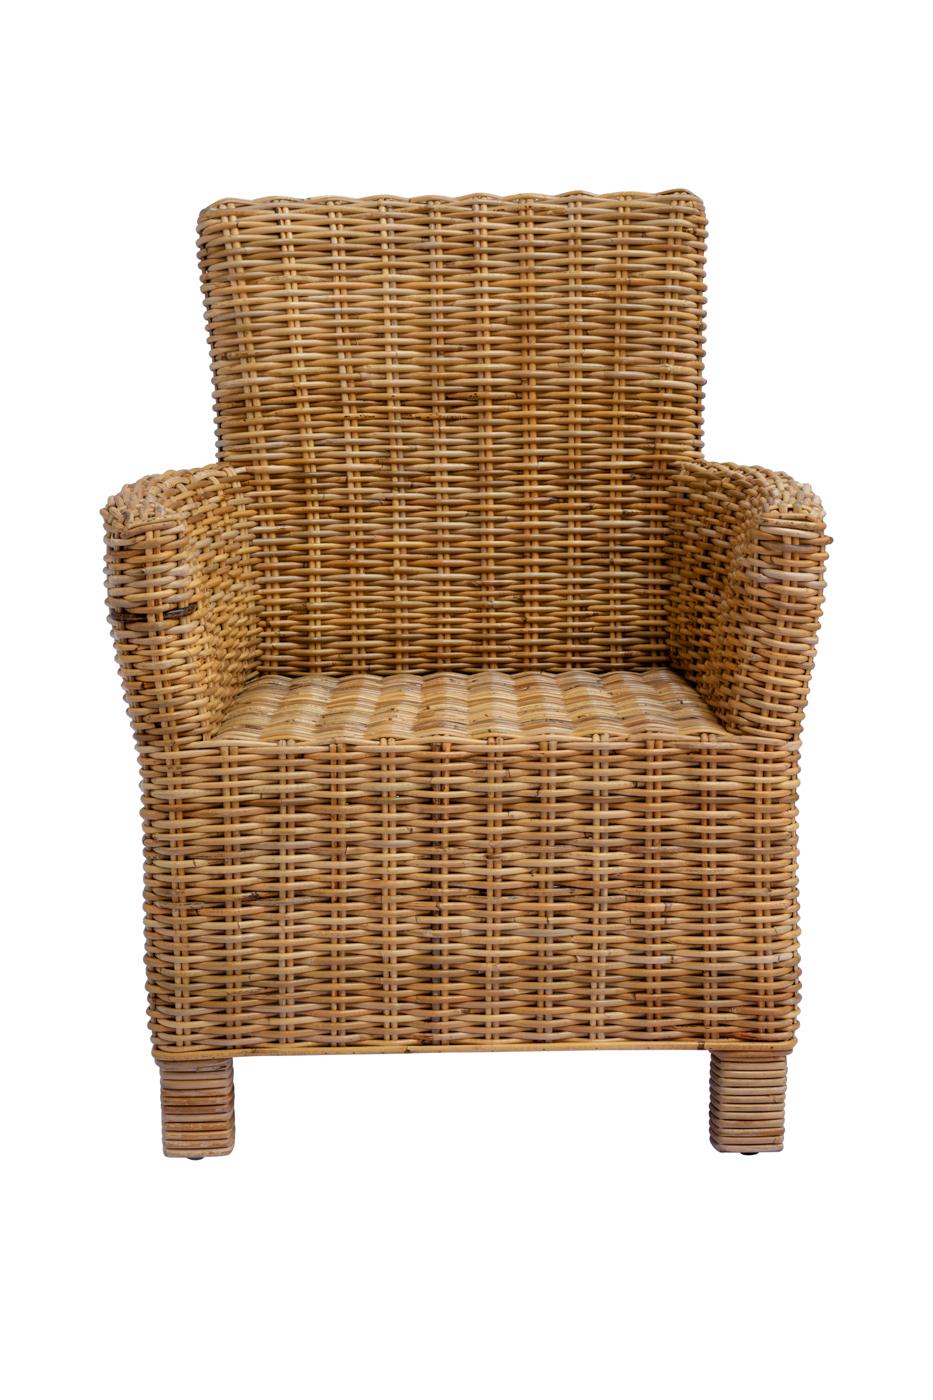 Ayak Malboro chair in rattan